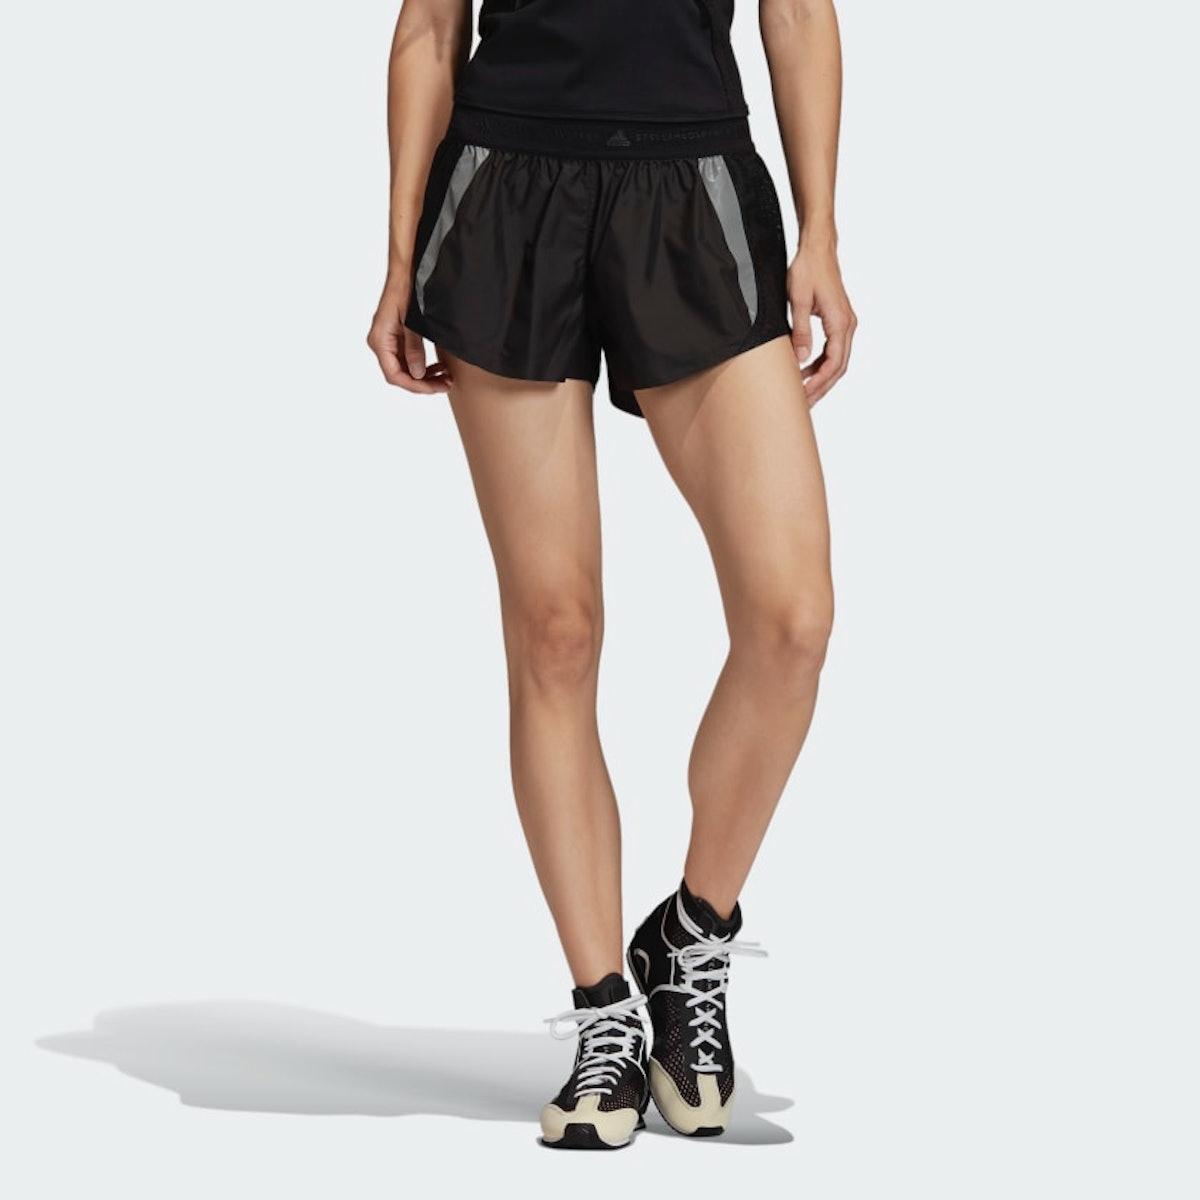 Stella McCartney x Adidas Lightweight Short